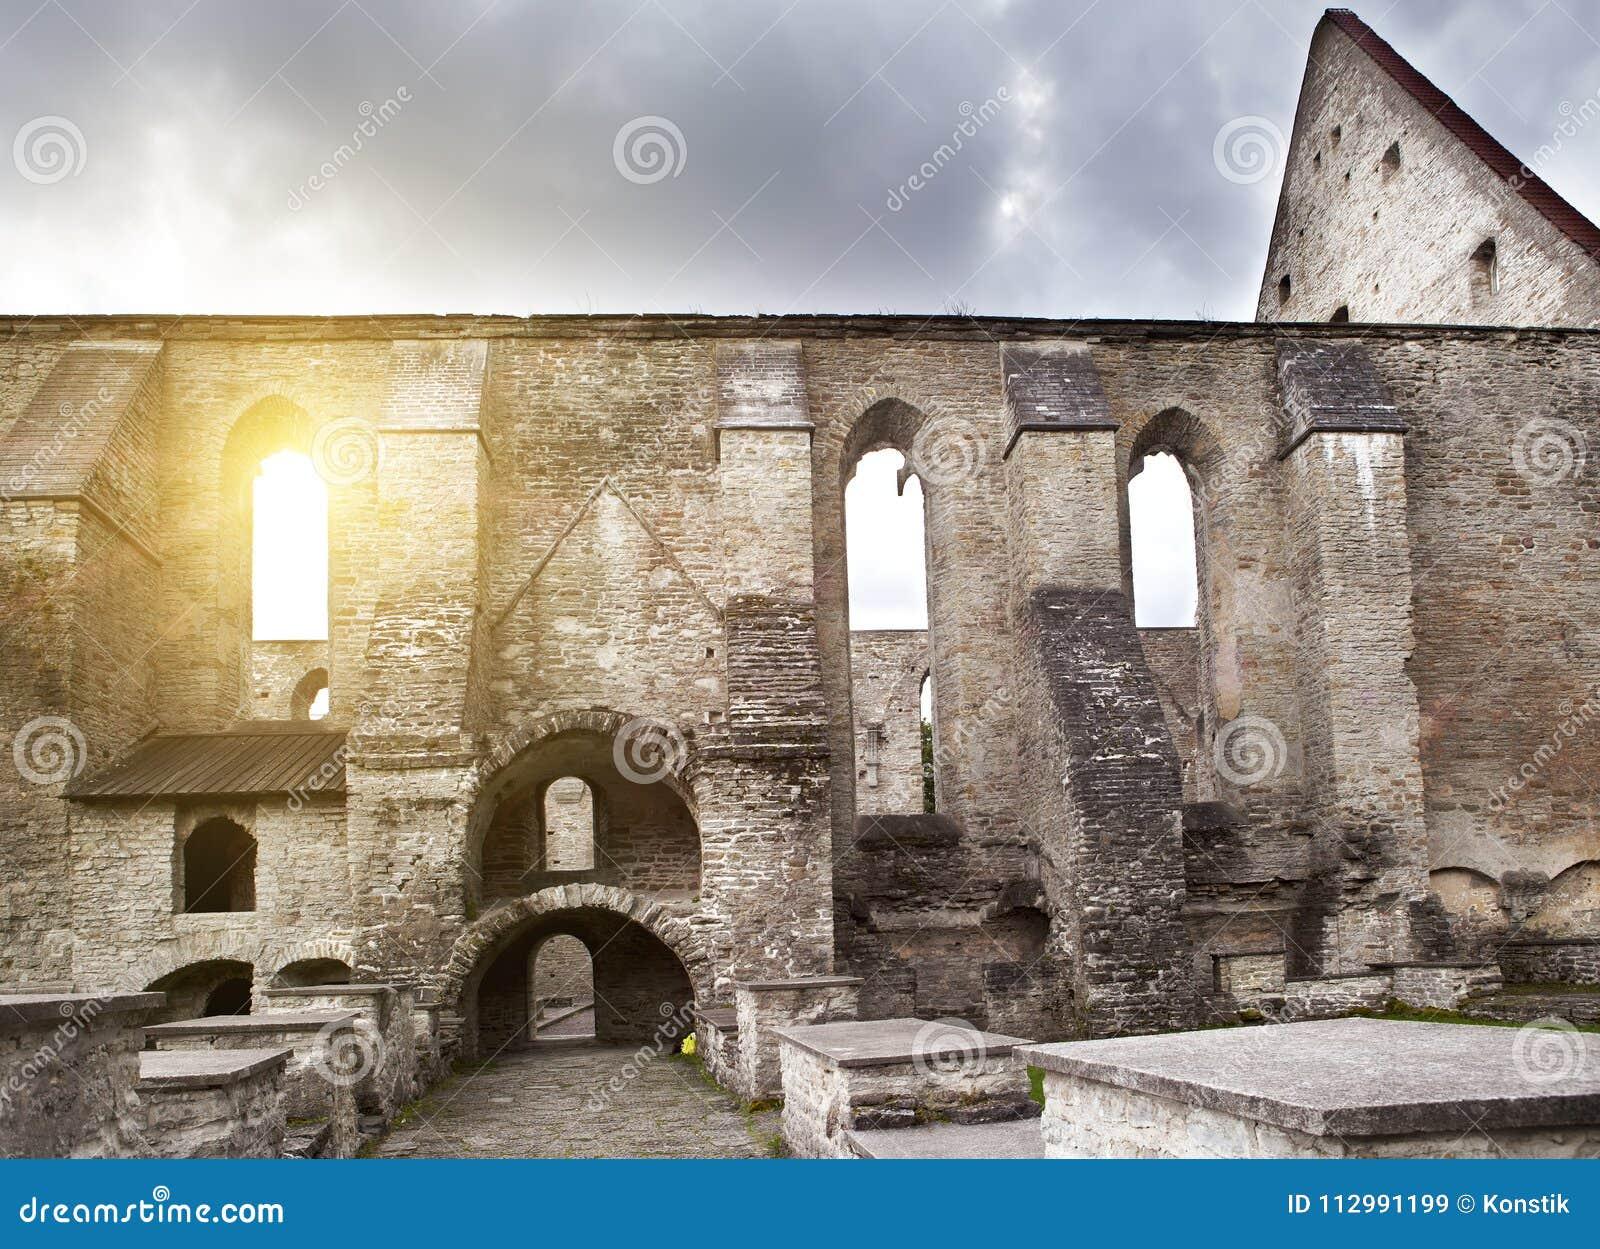 Ancient ruined St. Brigitta convent 1436 year in Pirita region, Tallinn, Estonia